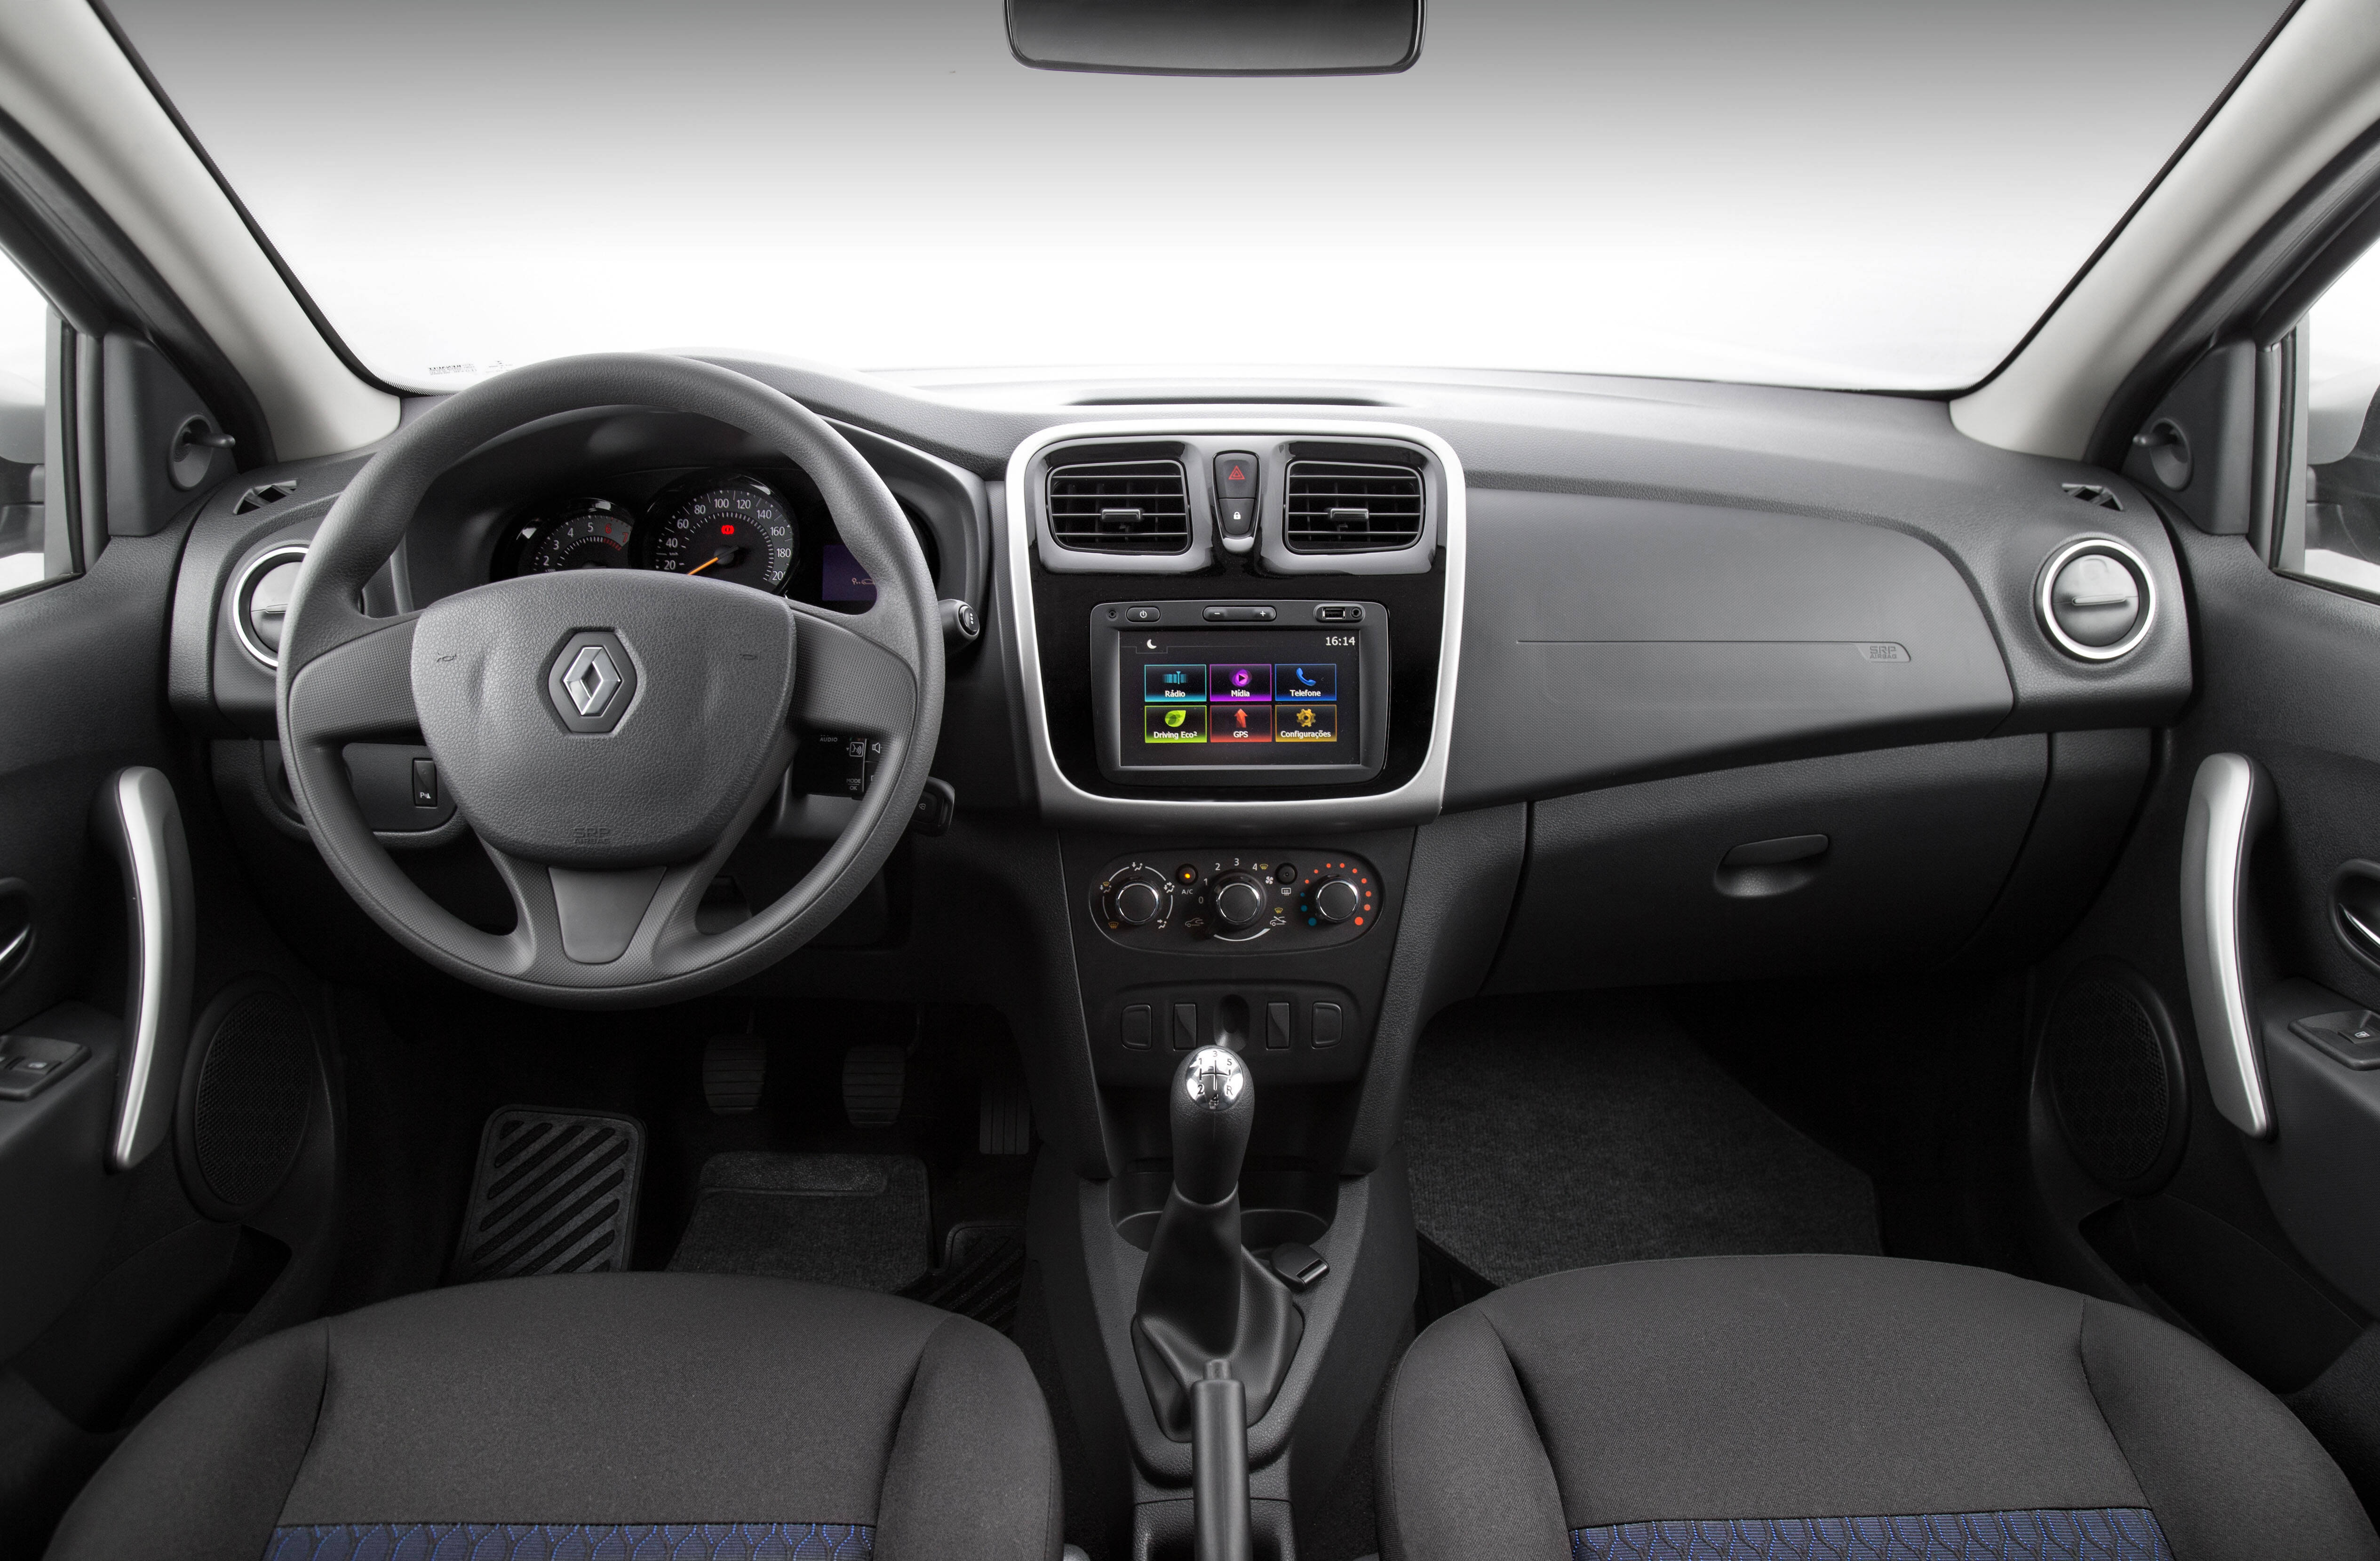 Renault Sandero 1.0. Foto: Divulgação